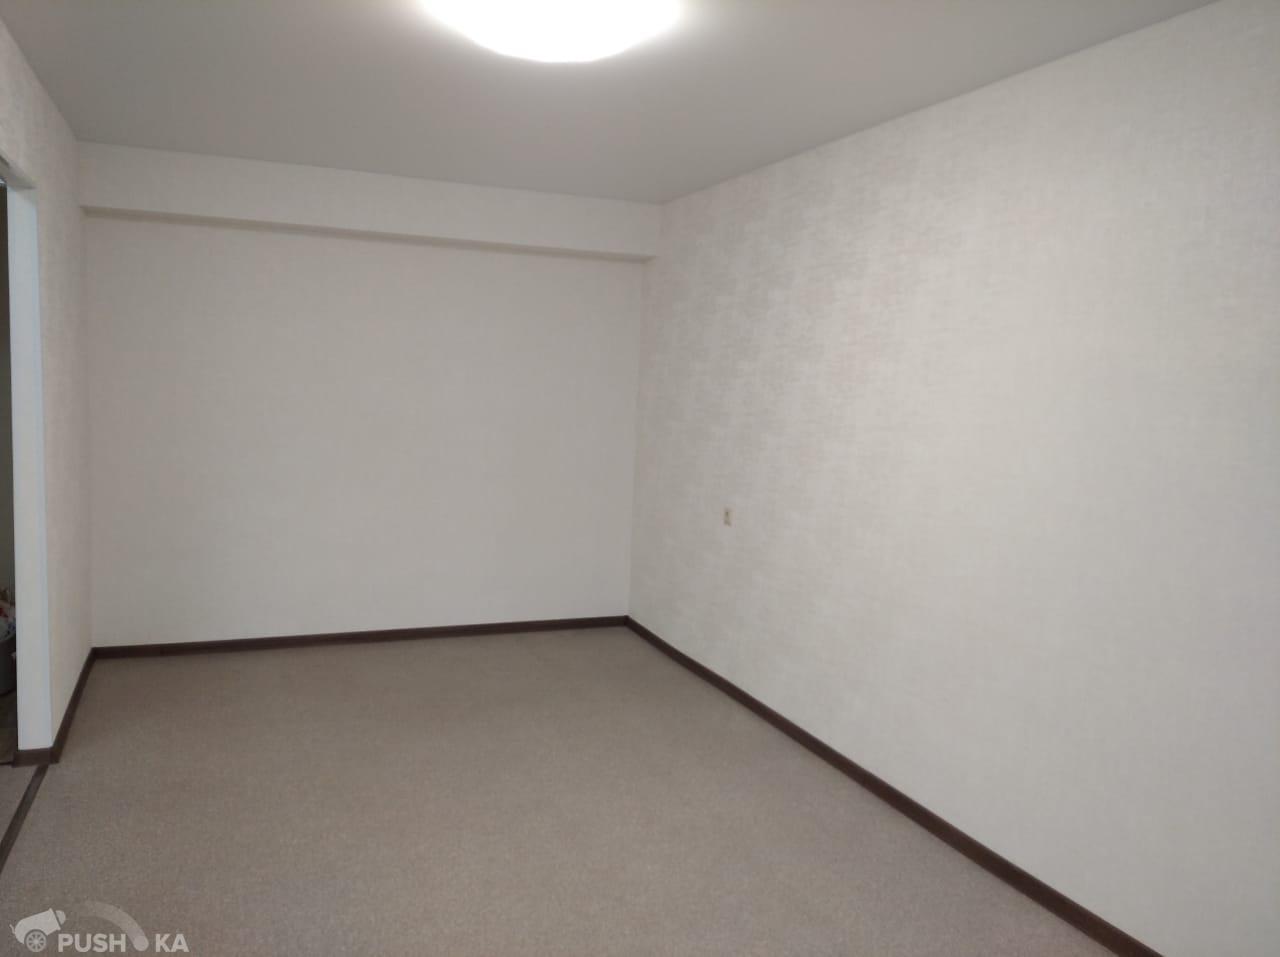 Продаётся 1-комнатная квартира 30.3 кв.м. этаж 6/9 за 8 500 000 руб